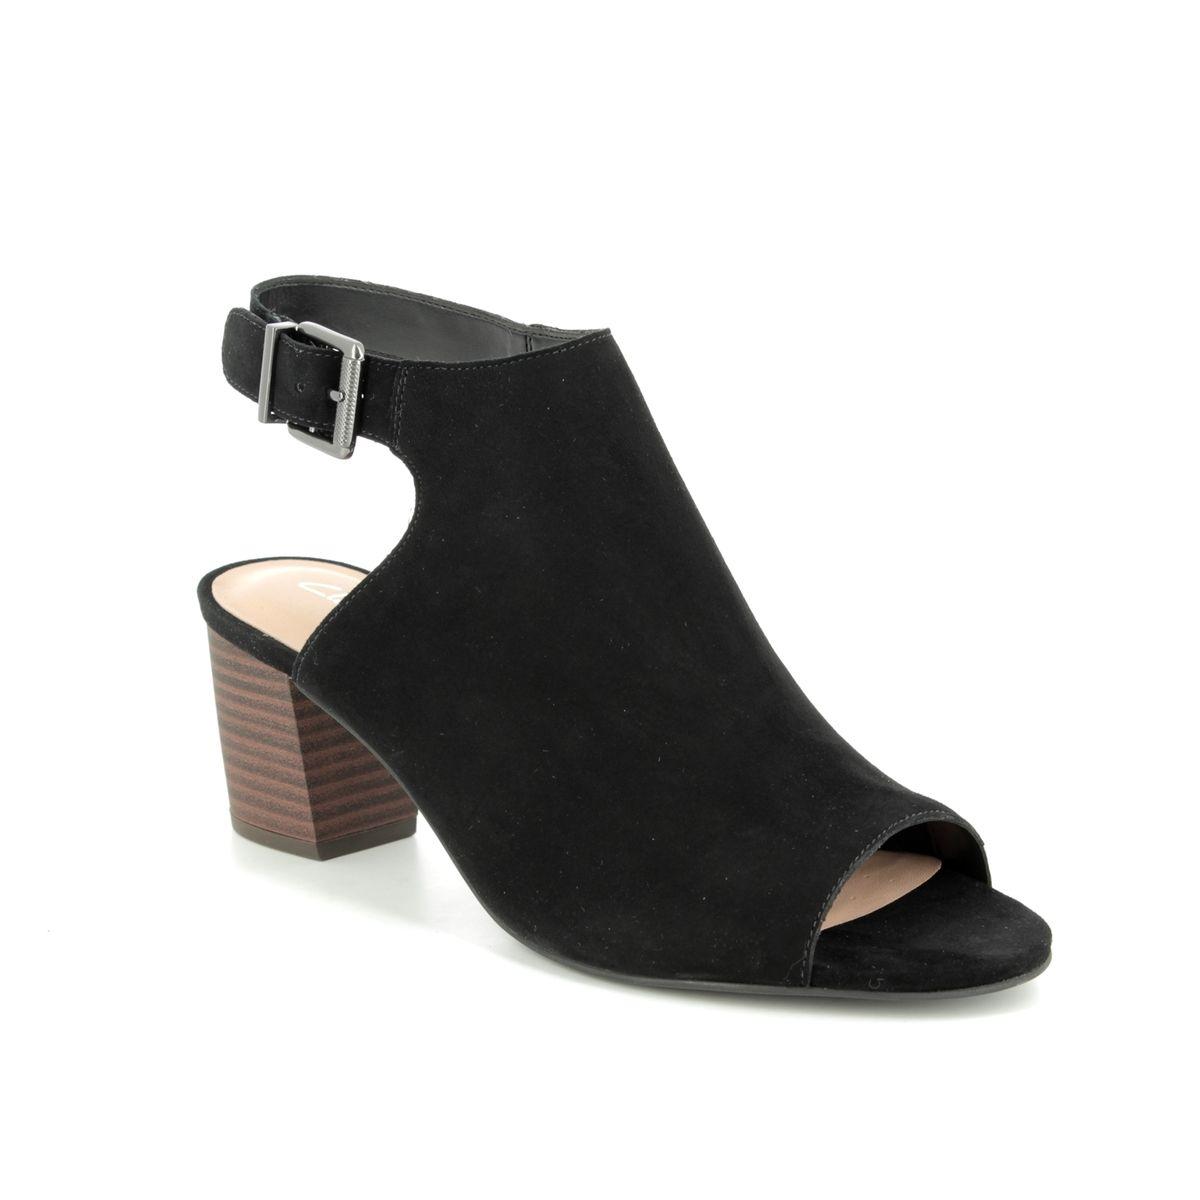 7f606c52fd9 Clarks Heeled Sandals - Black suede - 400994D DELORIA GIA